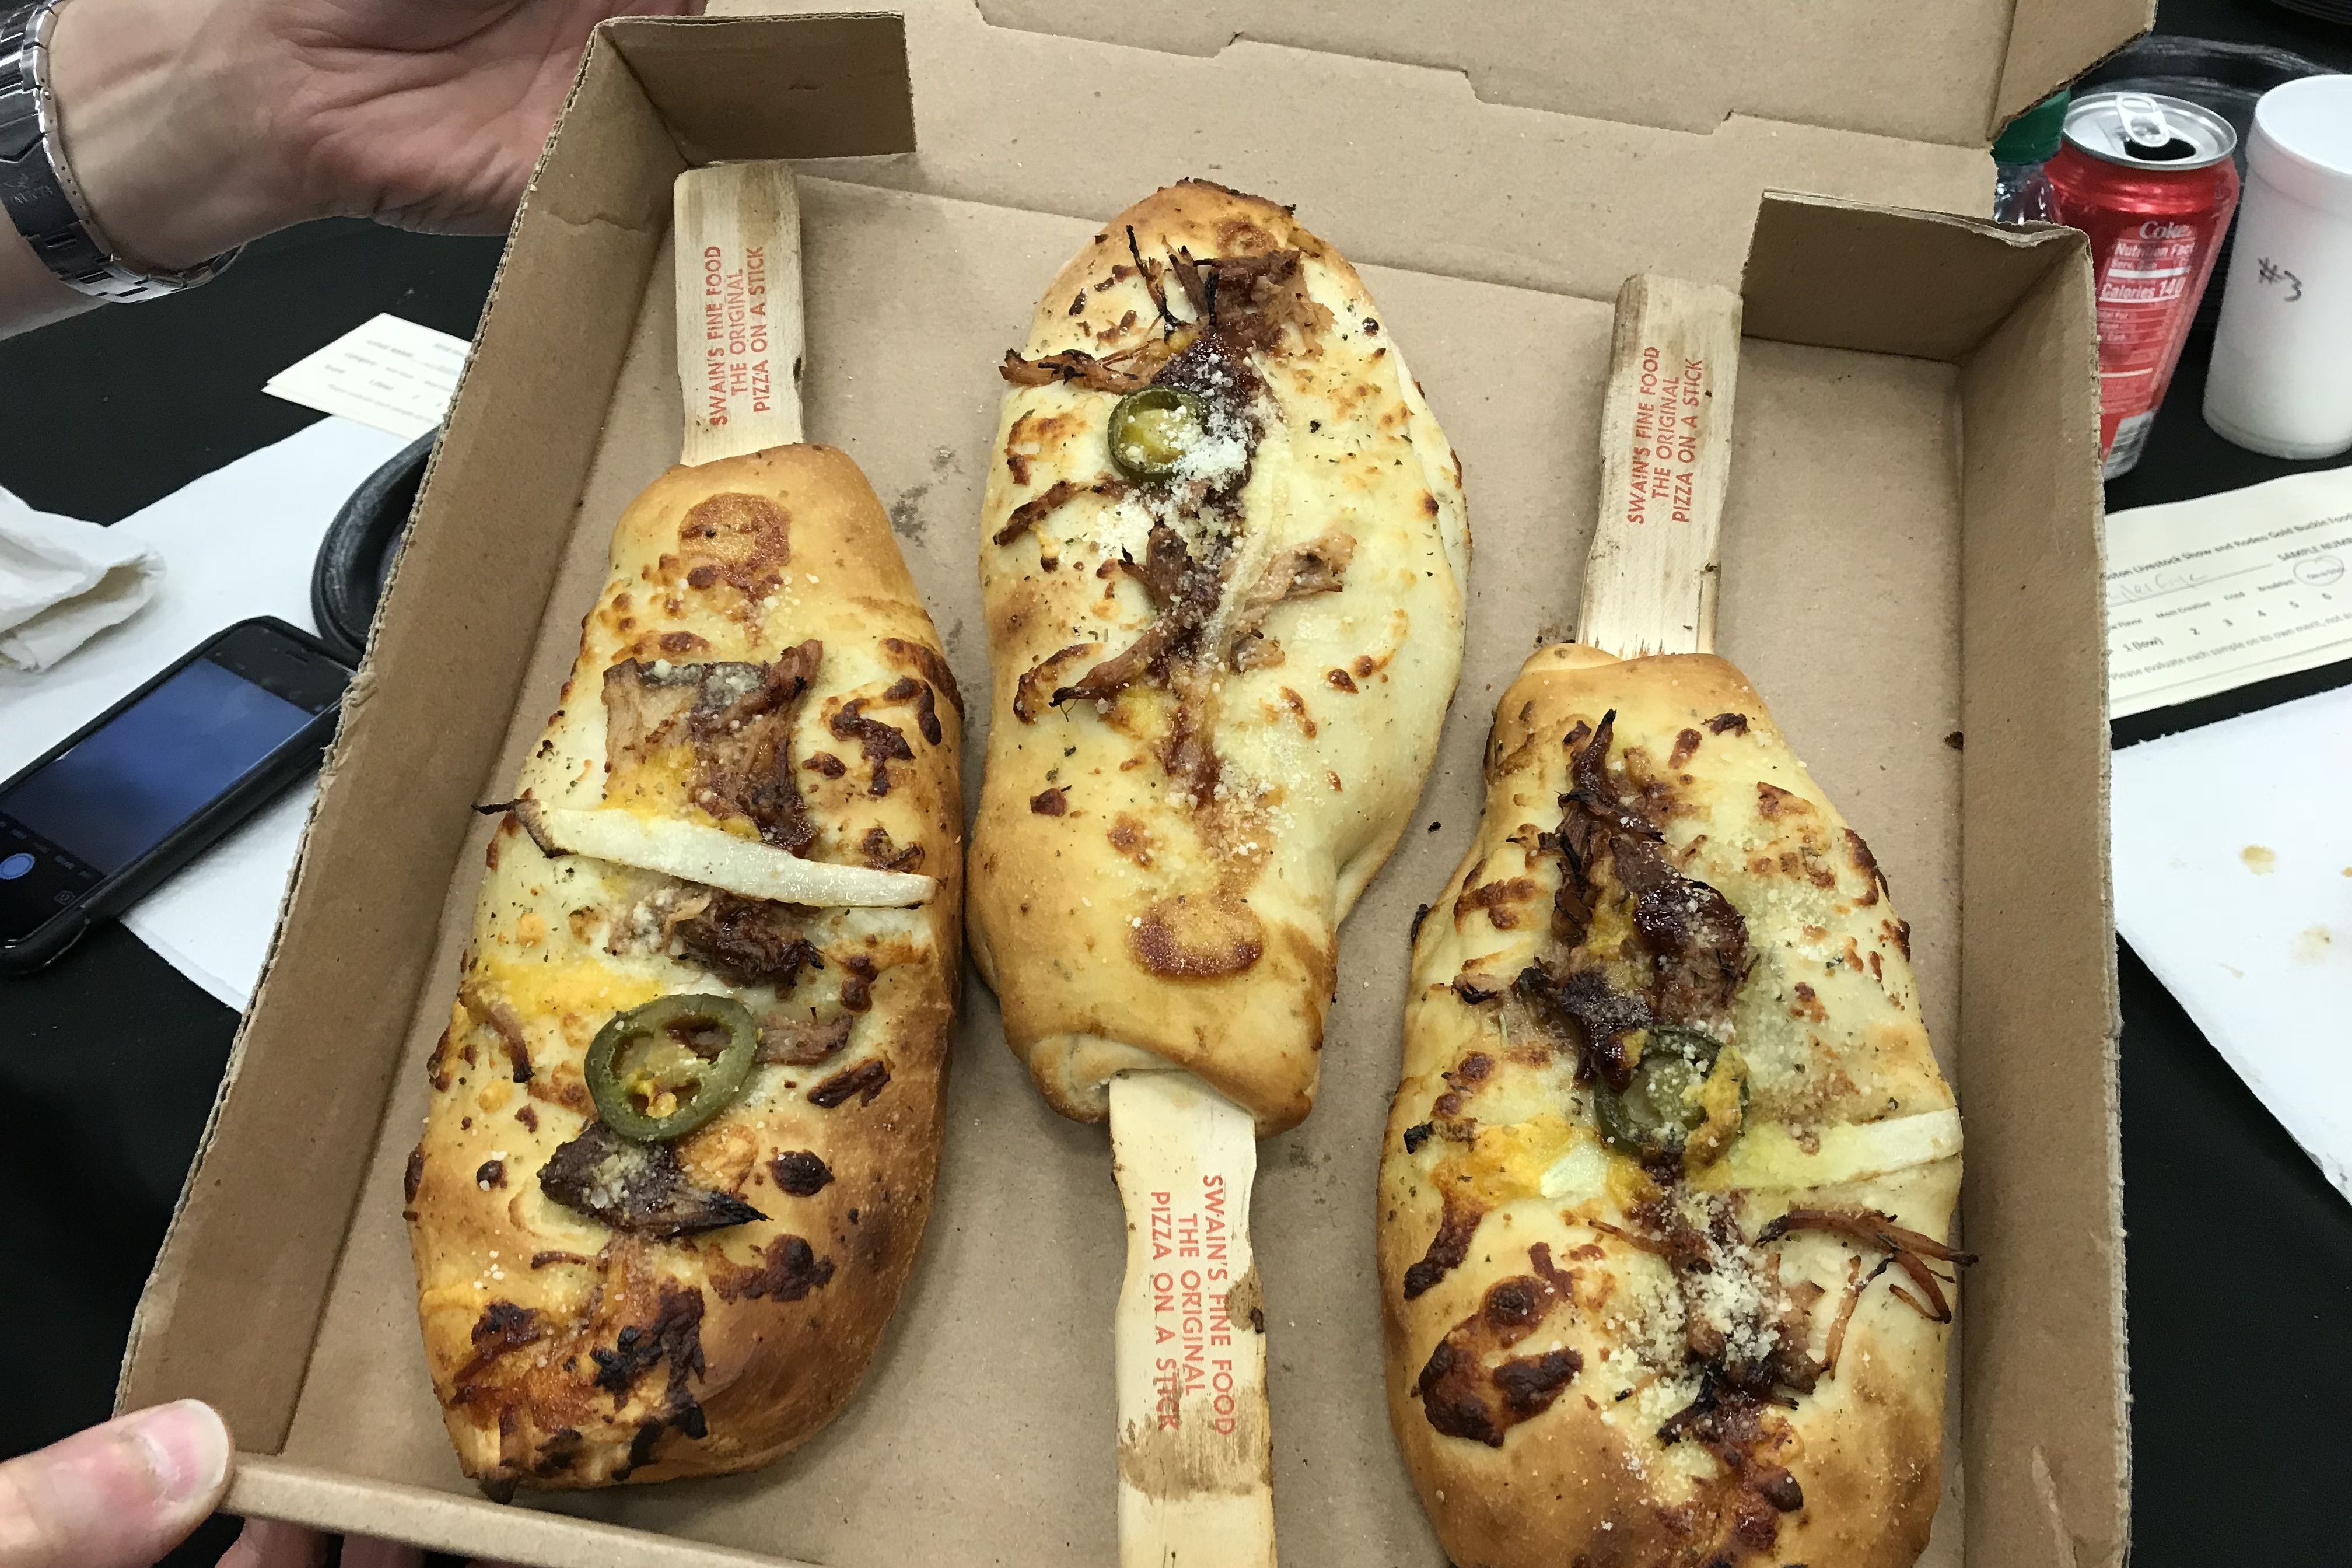 Pizzaonastick a3izfr